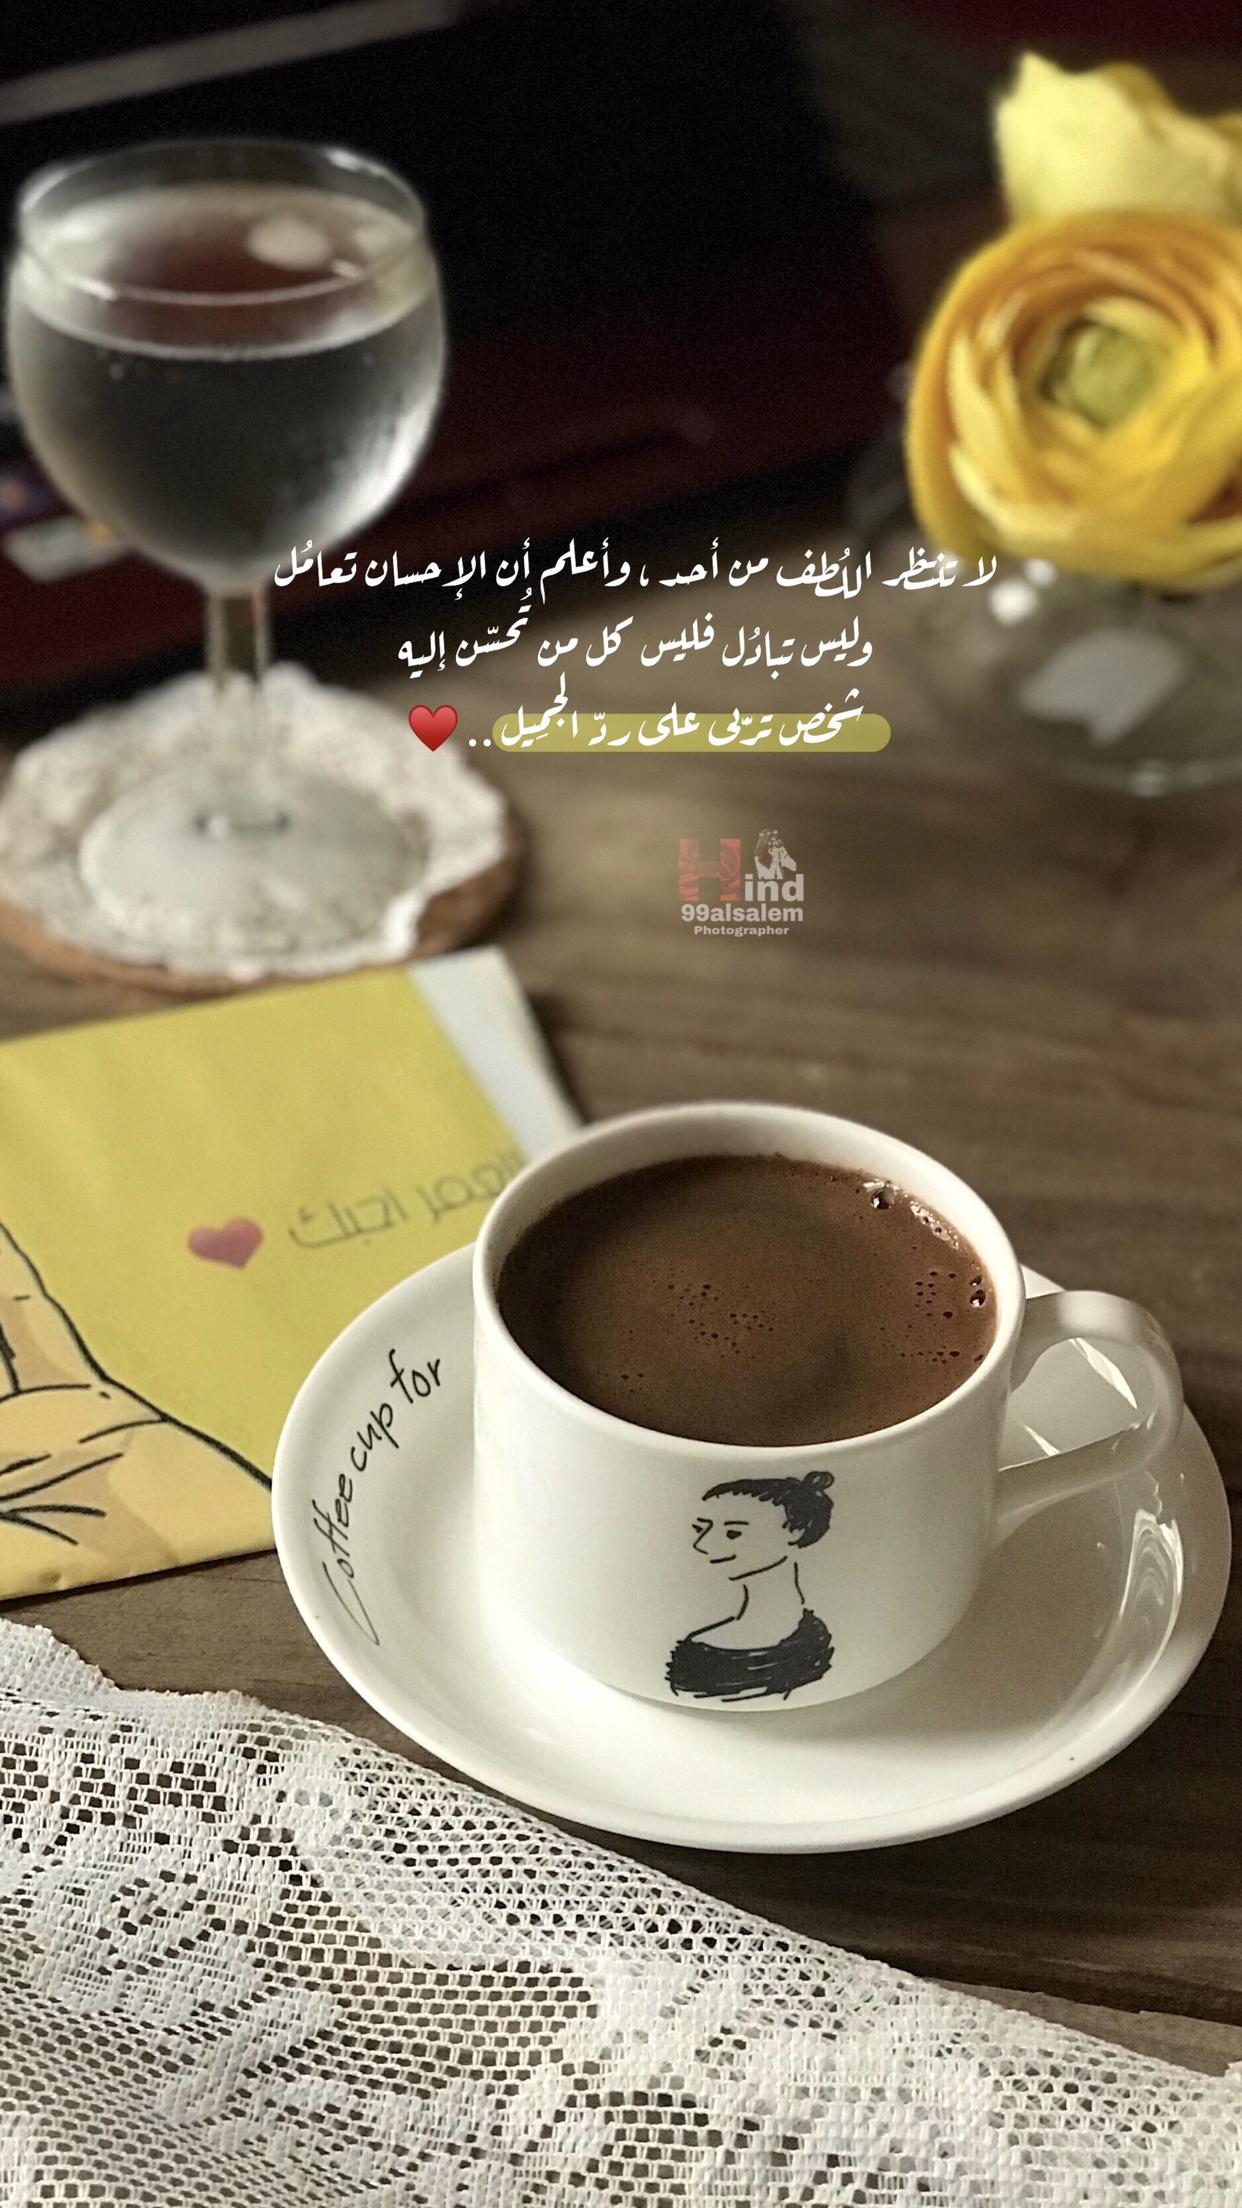 Pin By Darin Ahmad On صور احترافيه Coffee Slogans Islamic Quotes Wallpaper Arabic Coffee